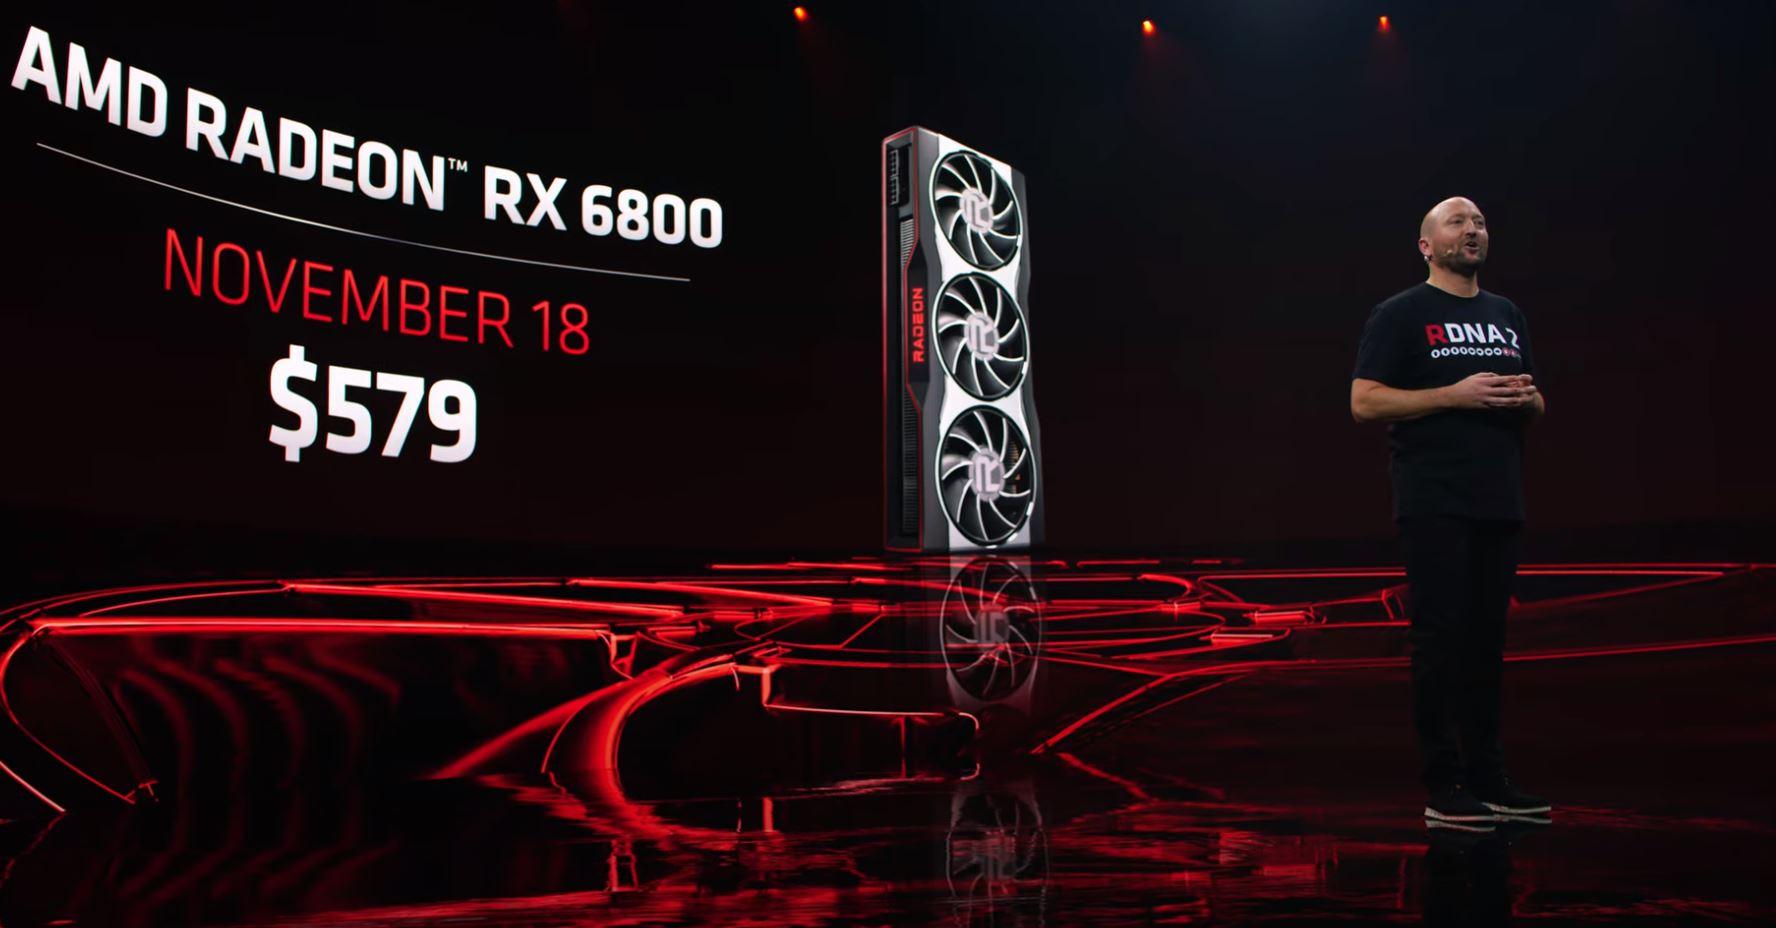 AMD Radeon RX 6800 Pricing